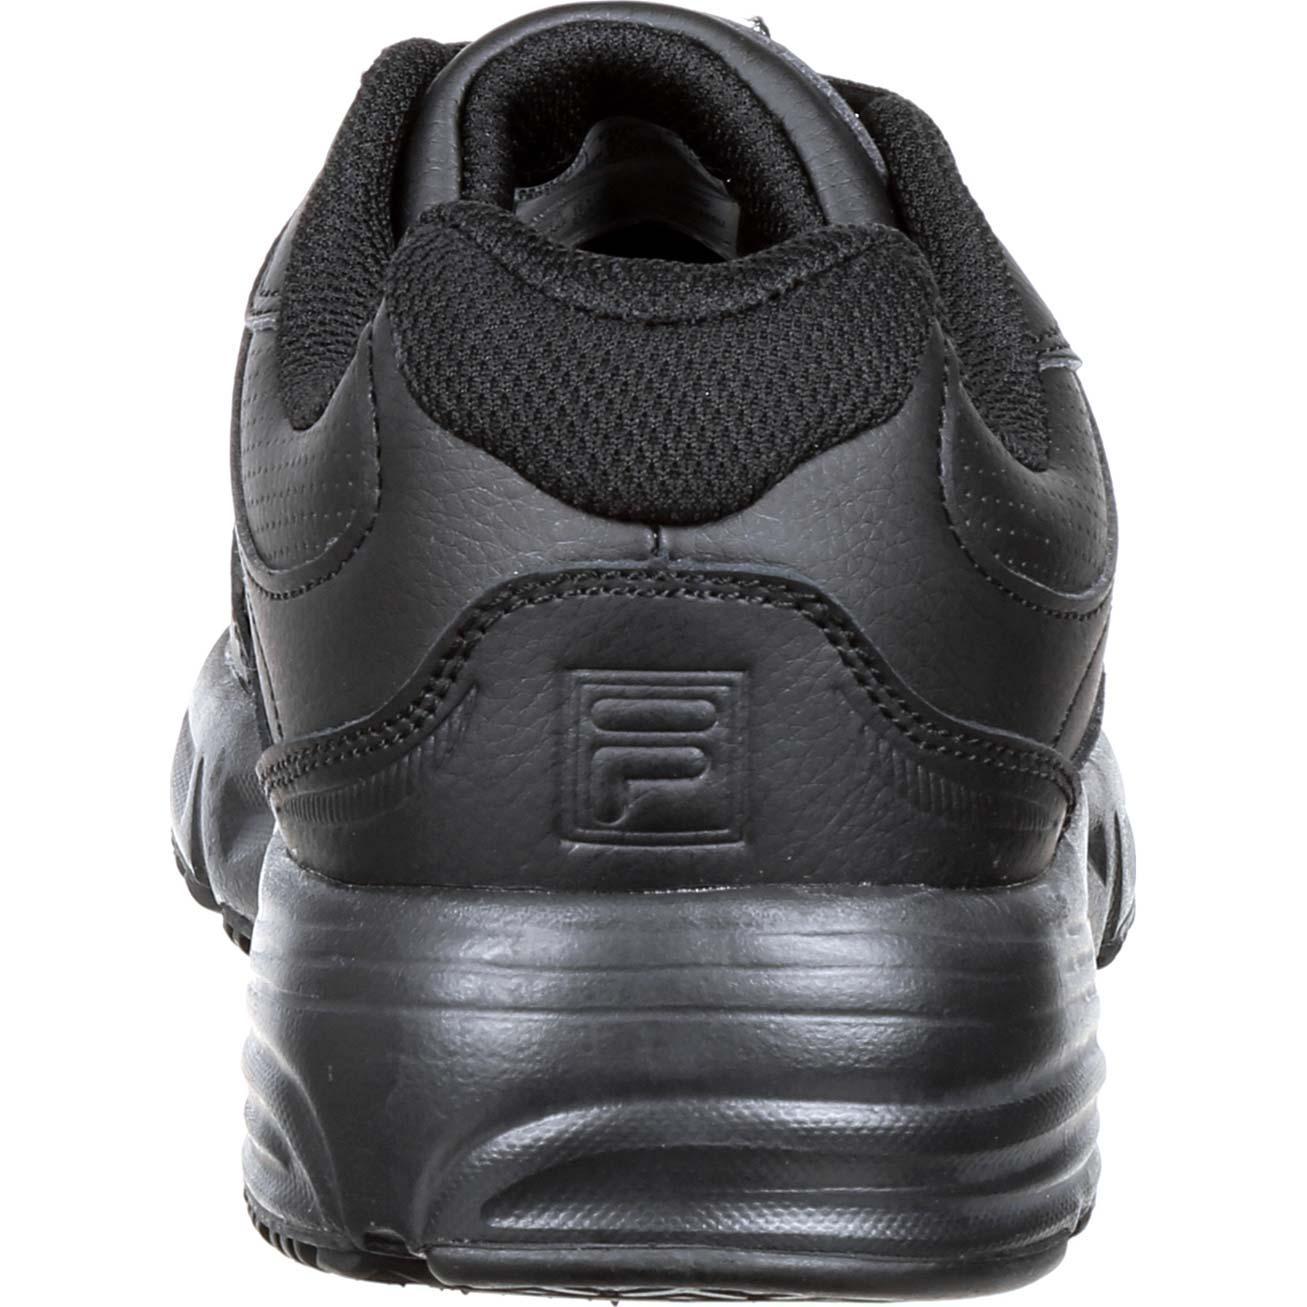 90458dd61331 Fila Men s Memory Workshift Slip Resistant Steel Toe Work Shoes